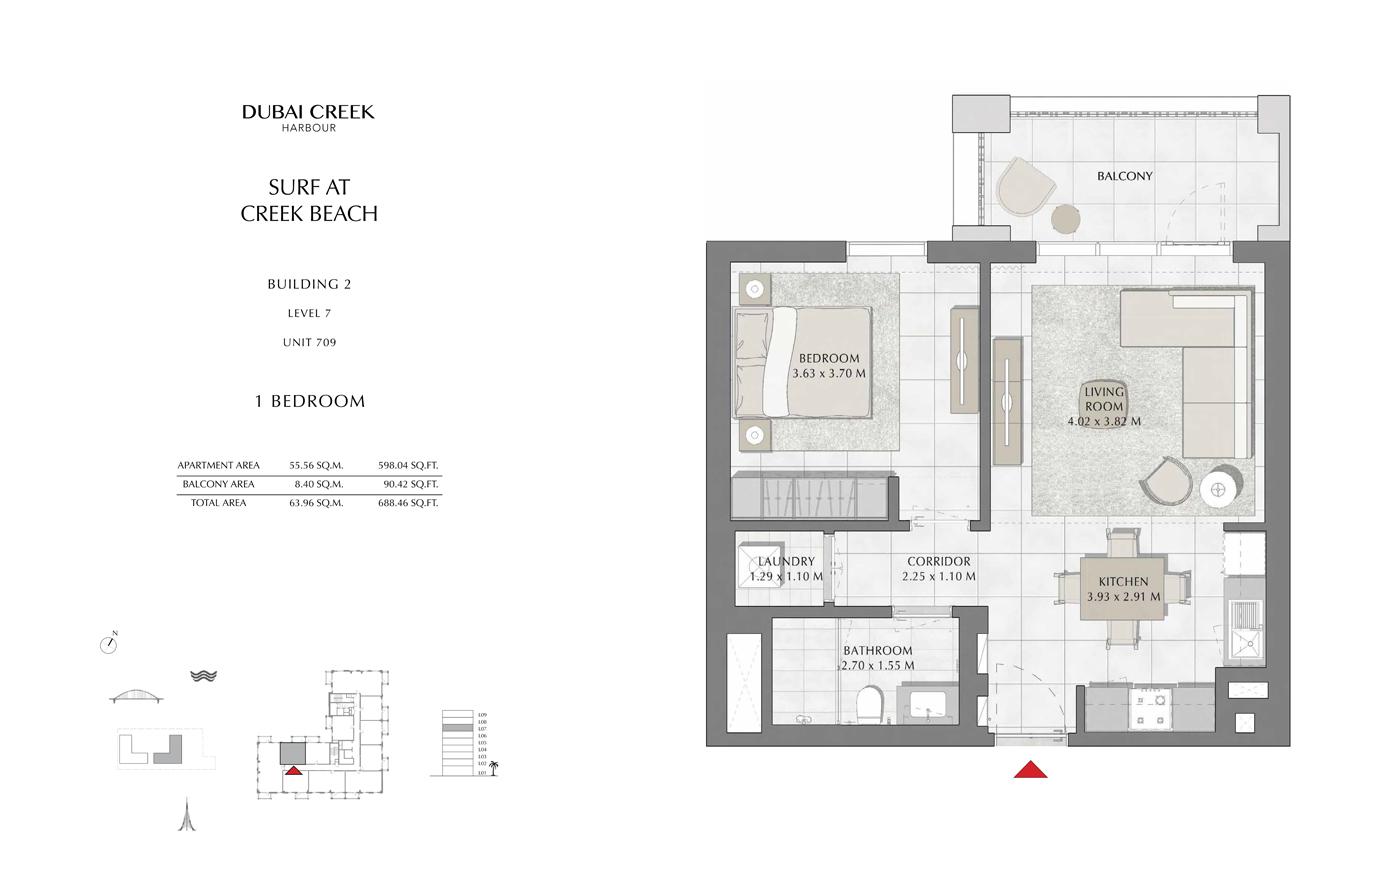 Building 2, 1 Bedroom Level 7, Size 688 Sq Ft